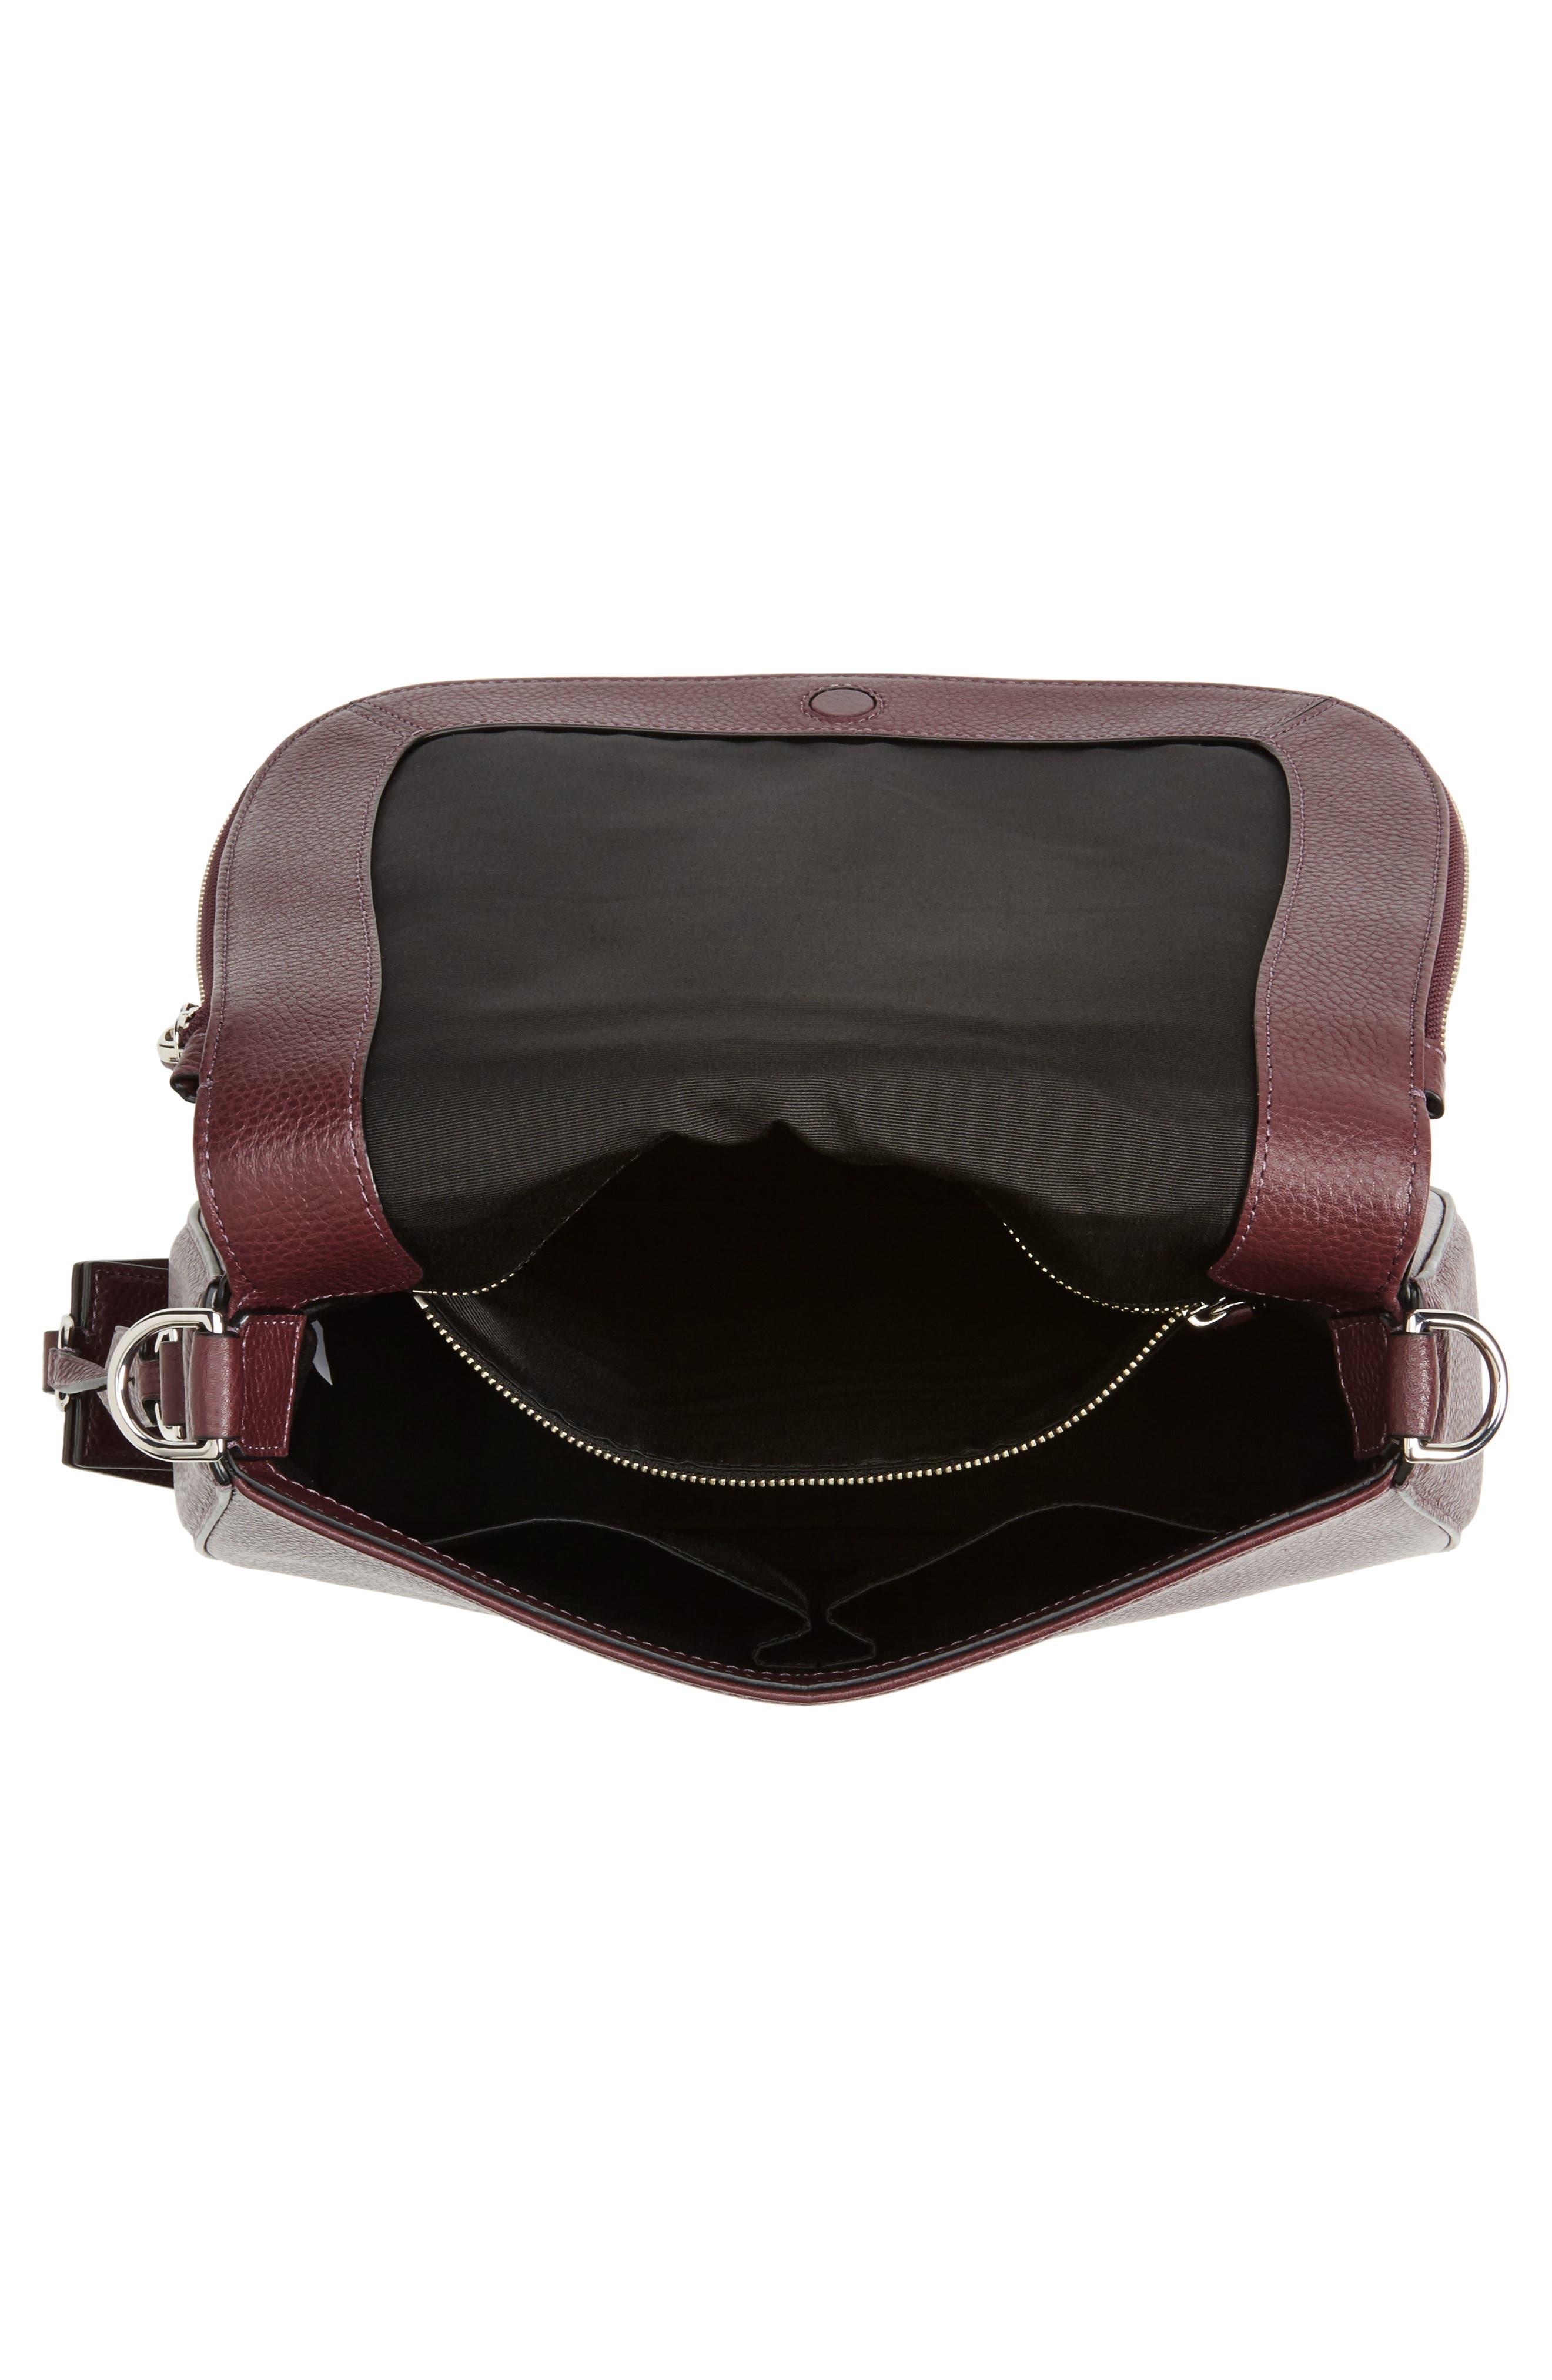 Recruit Nomad Pebbled Leather Crossbody Bag,                             Alternate thumbnail 4, color,                             538